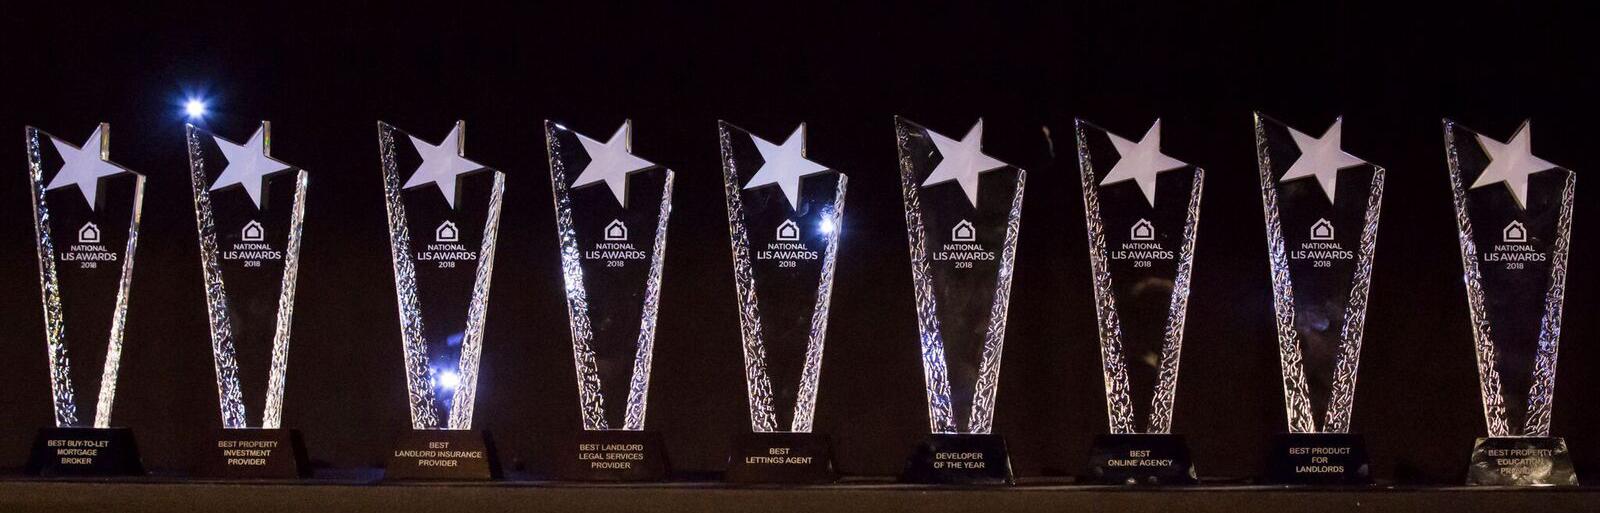 row of awards.jpg